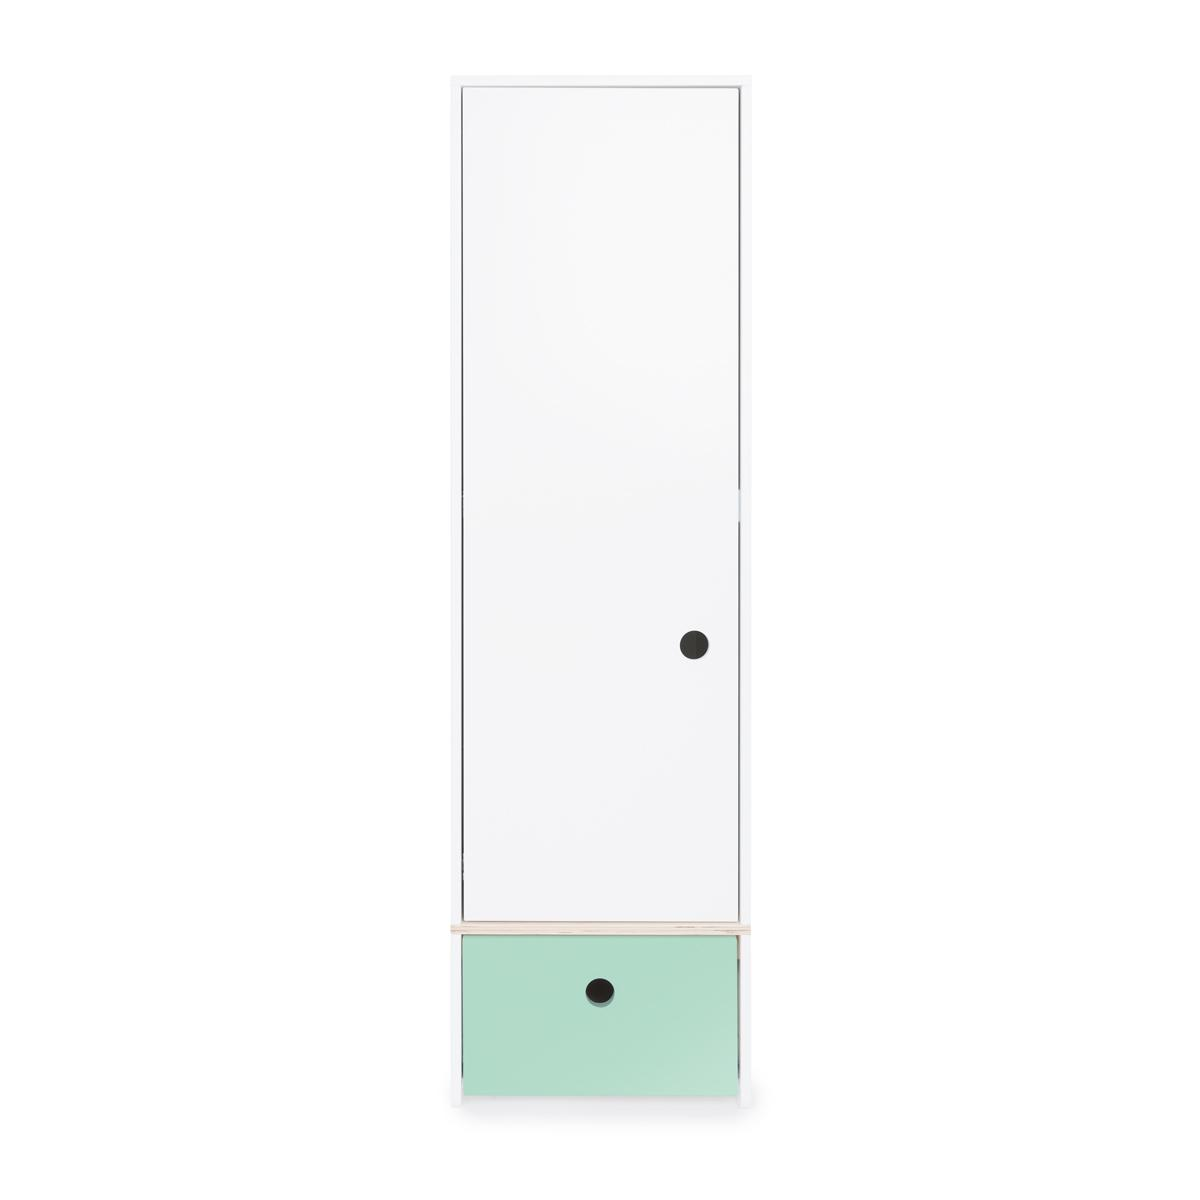 Armoire 1 porte COLORFLEX façade tiroir mint